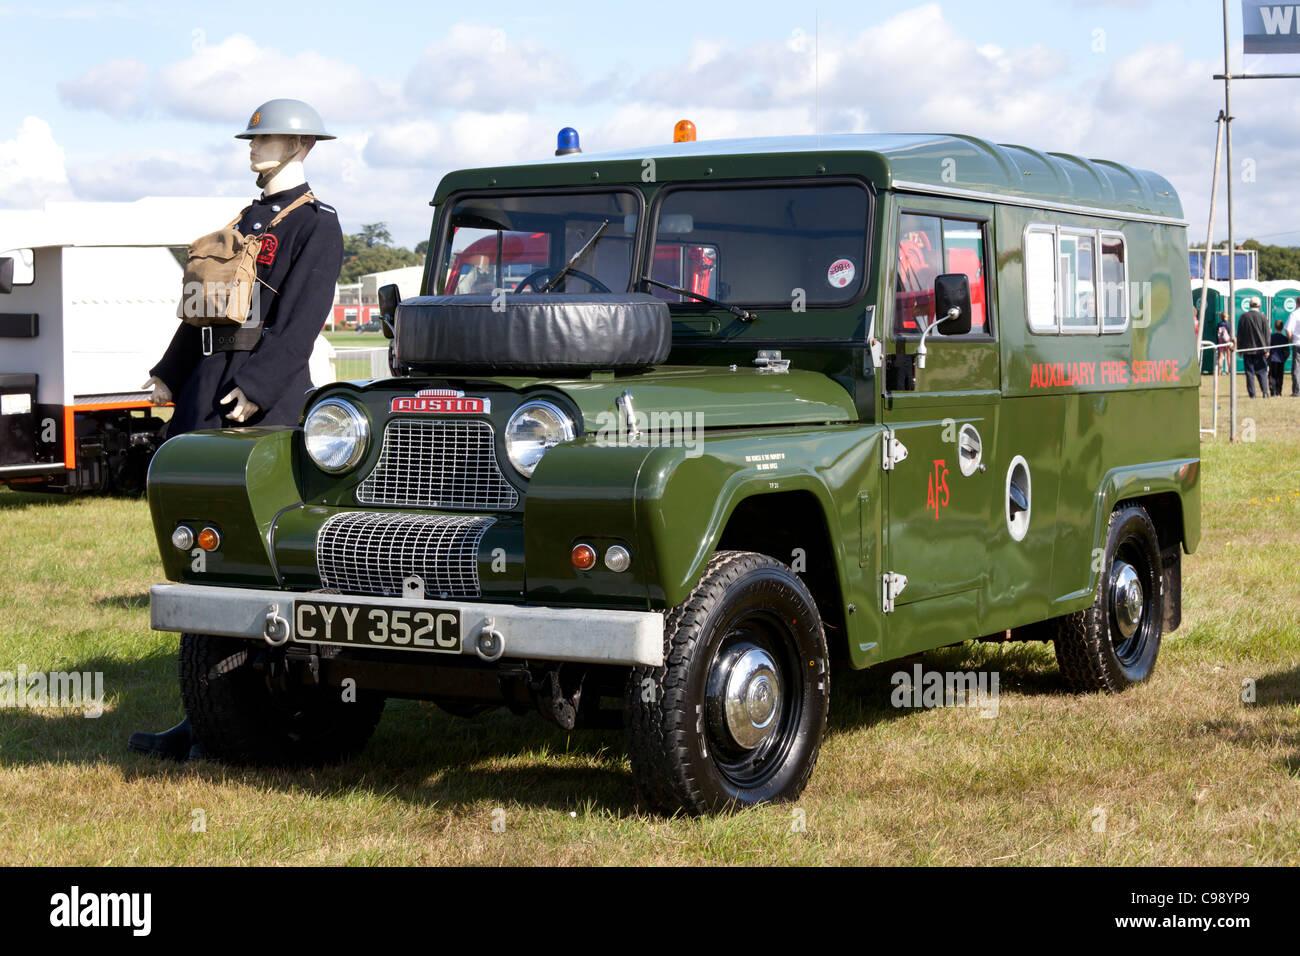 Austin Gypsy on display at Dunsfold Wings and Wheels 2011, Surrey, UK - Stock Image